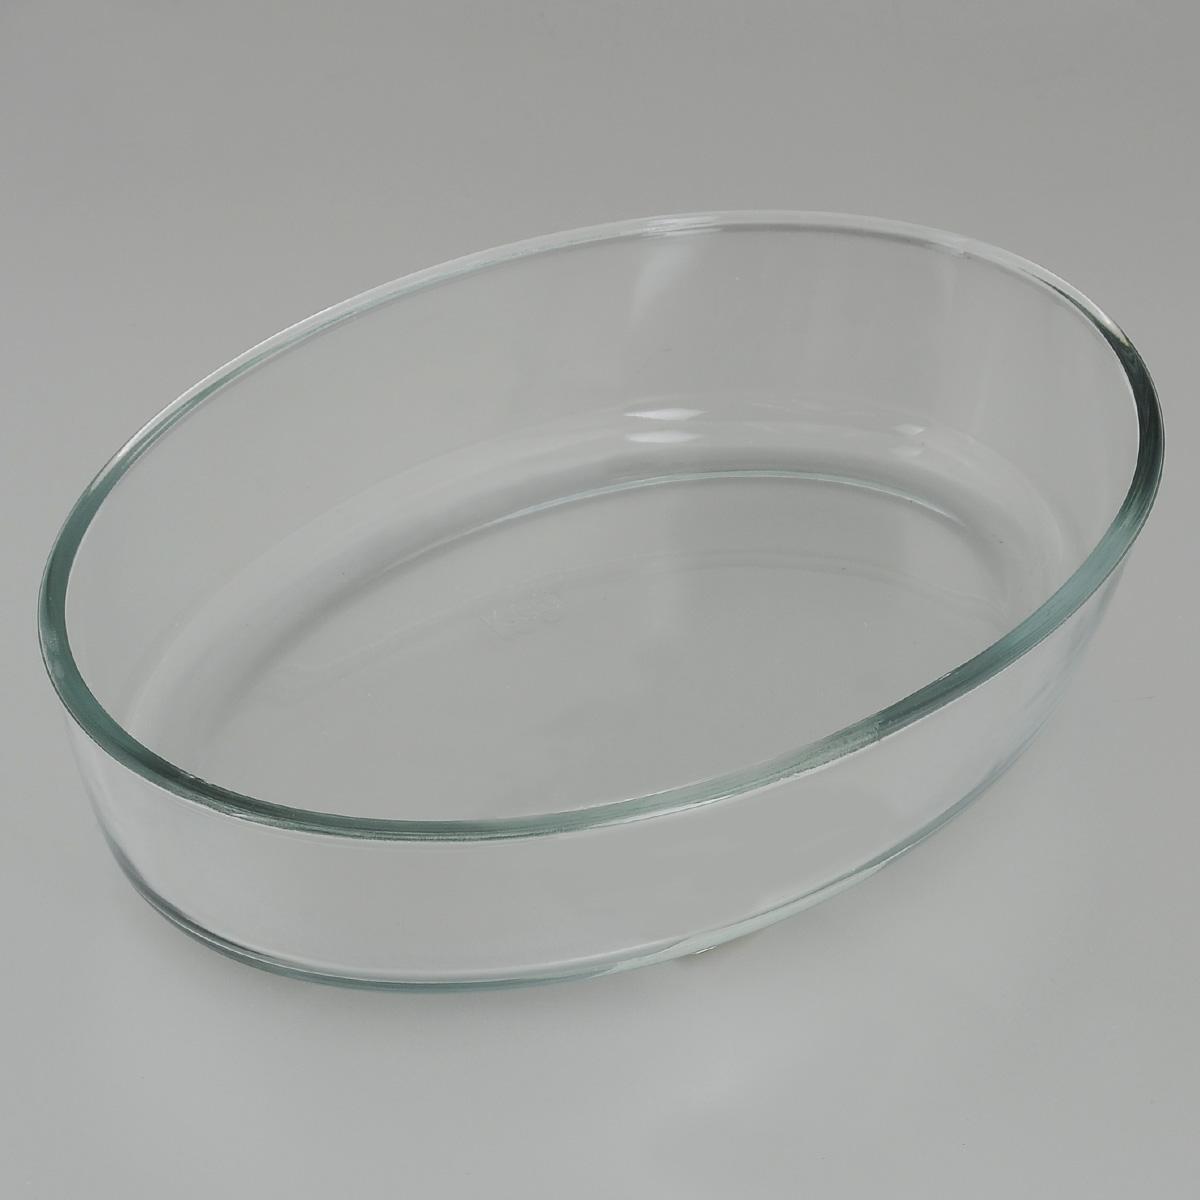 Форма для запекания Едим Дома, овальная, 30 х 21 см форма для запекания ceraflame цвет красный 31 см х 21 см